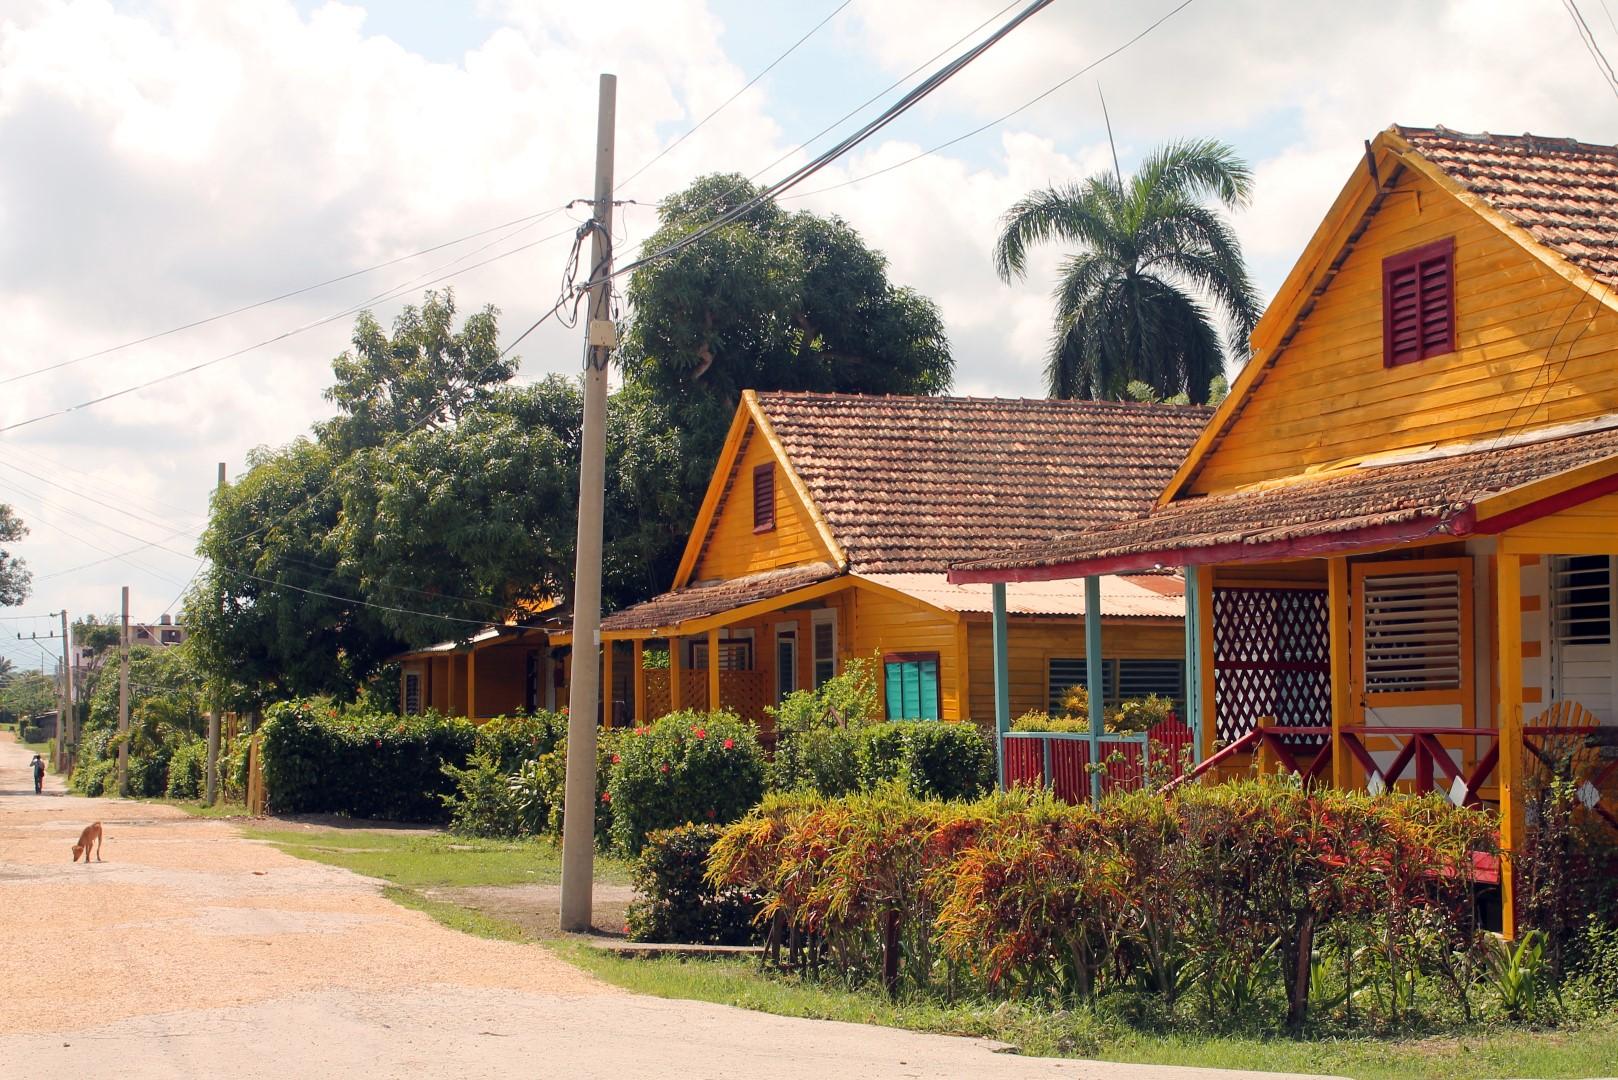 Preston, Cuba - OrkideEkspressen